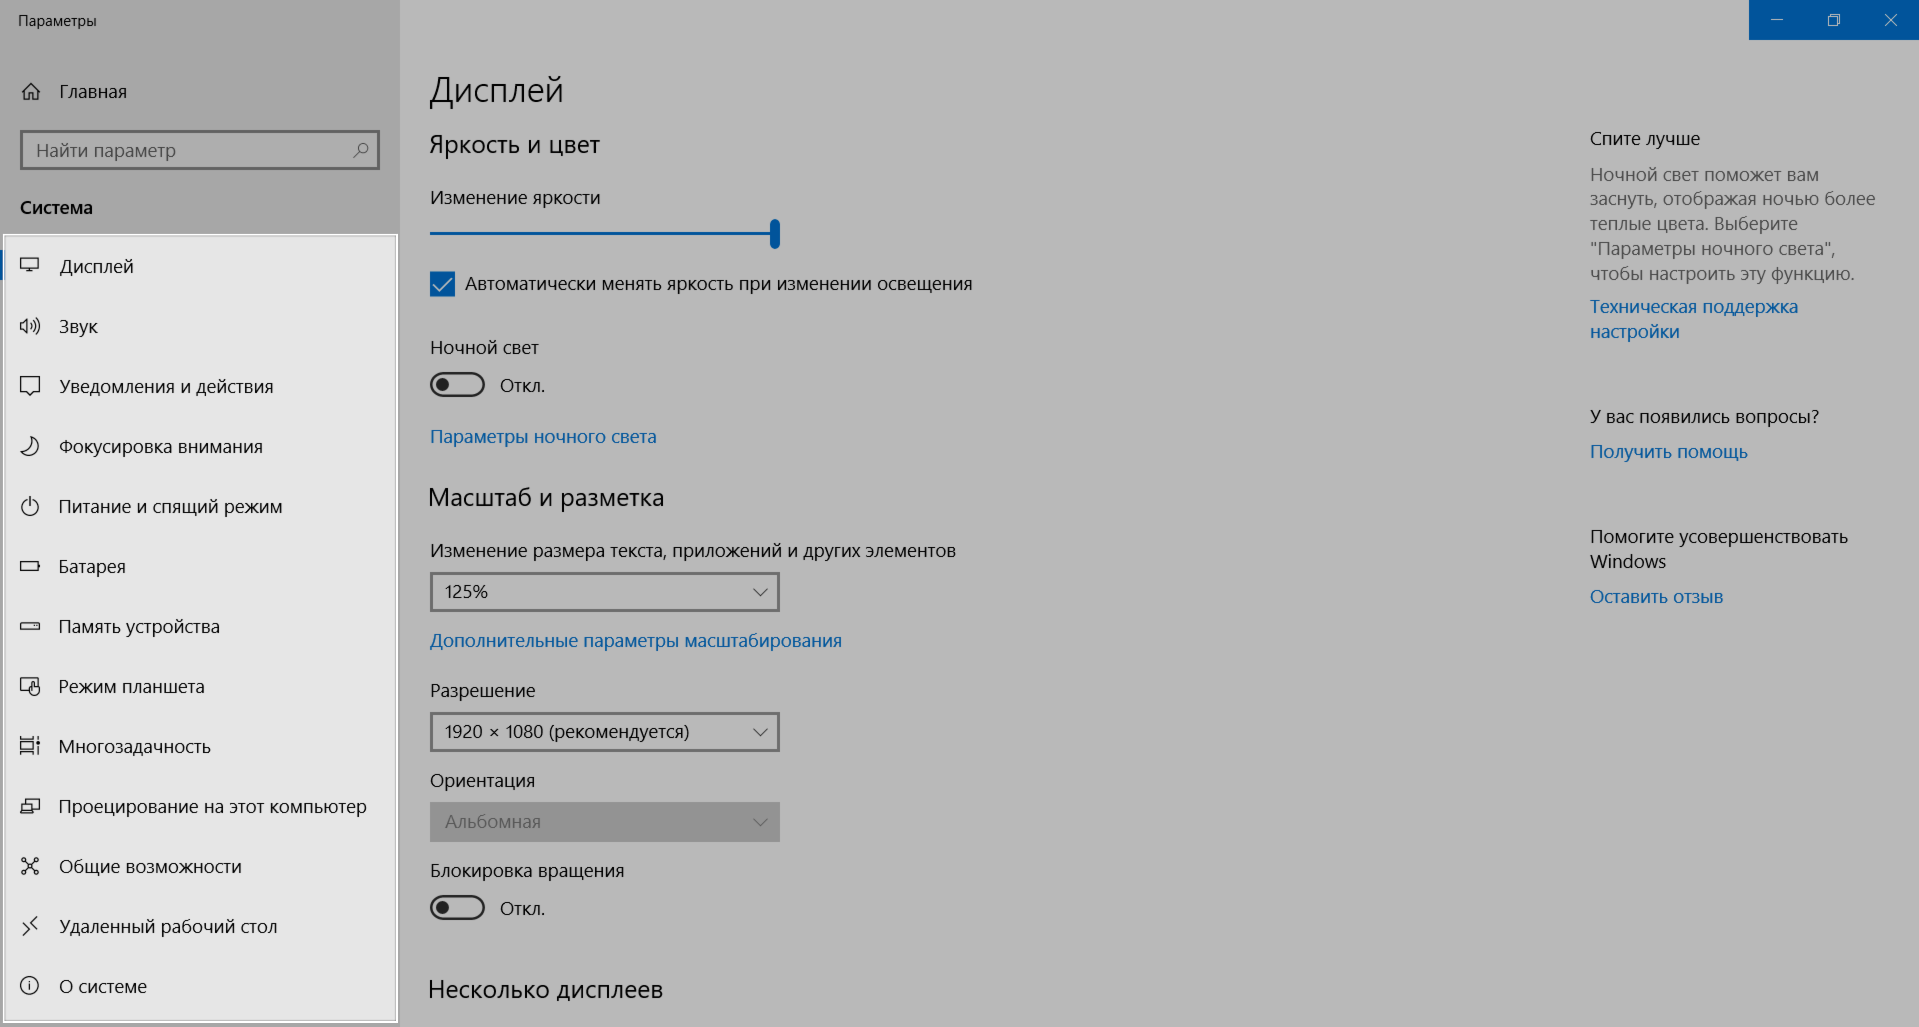 Вариант вкладок в интерфейсе 2